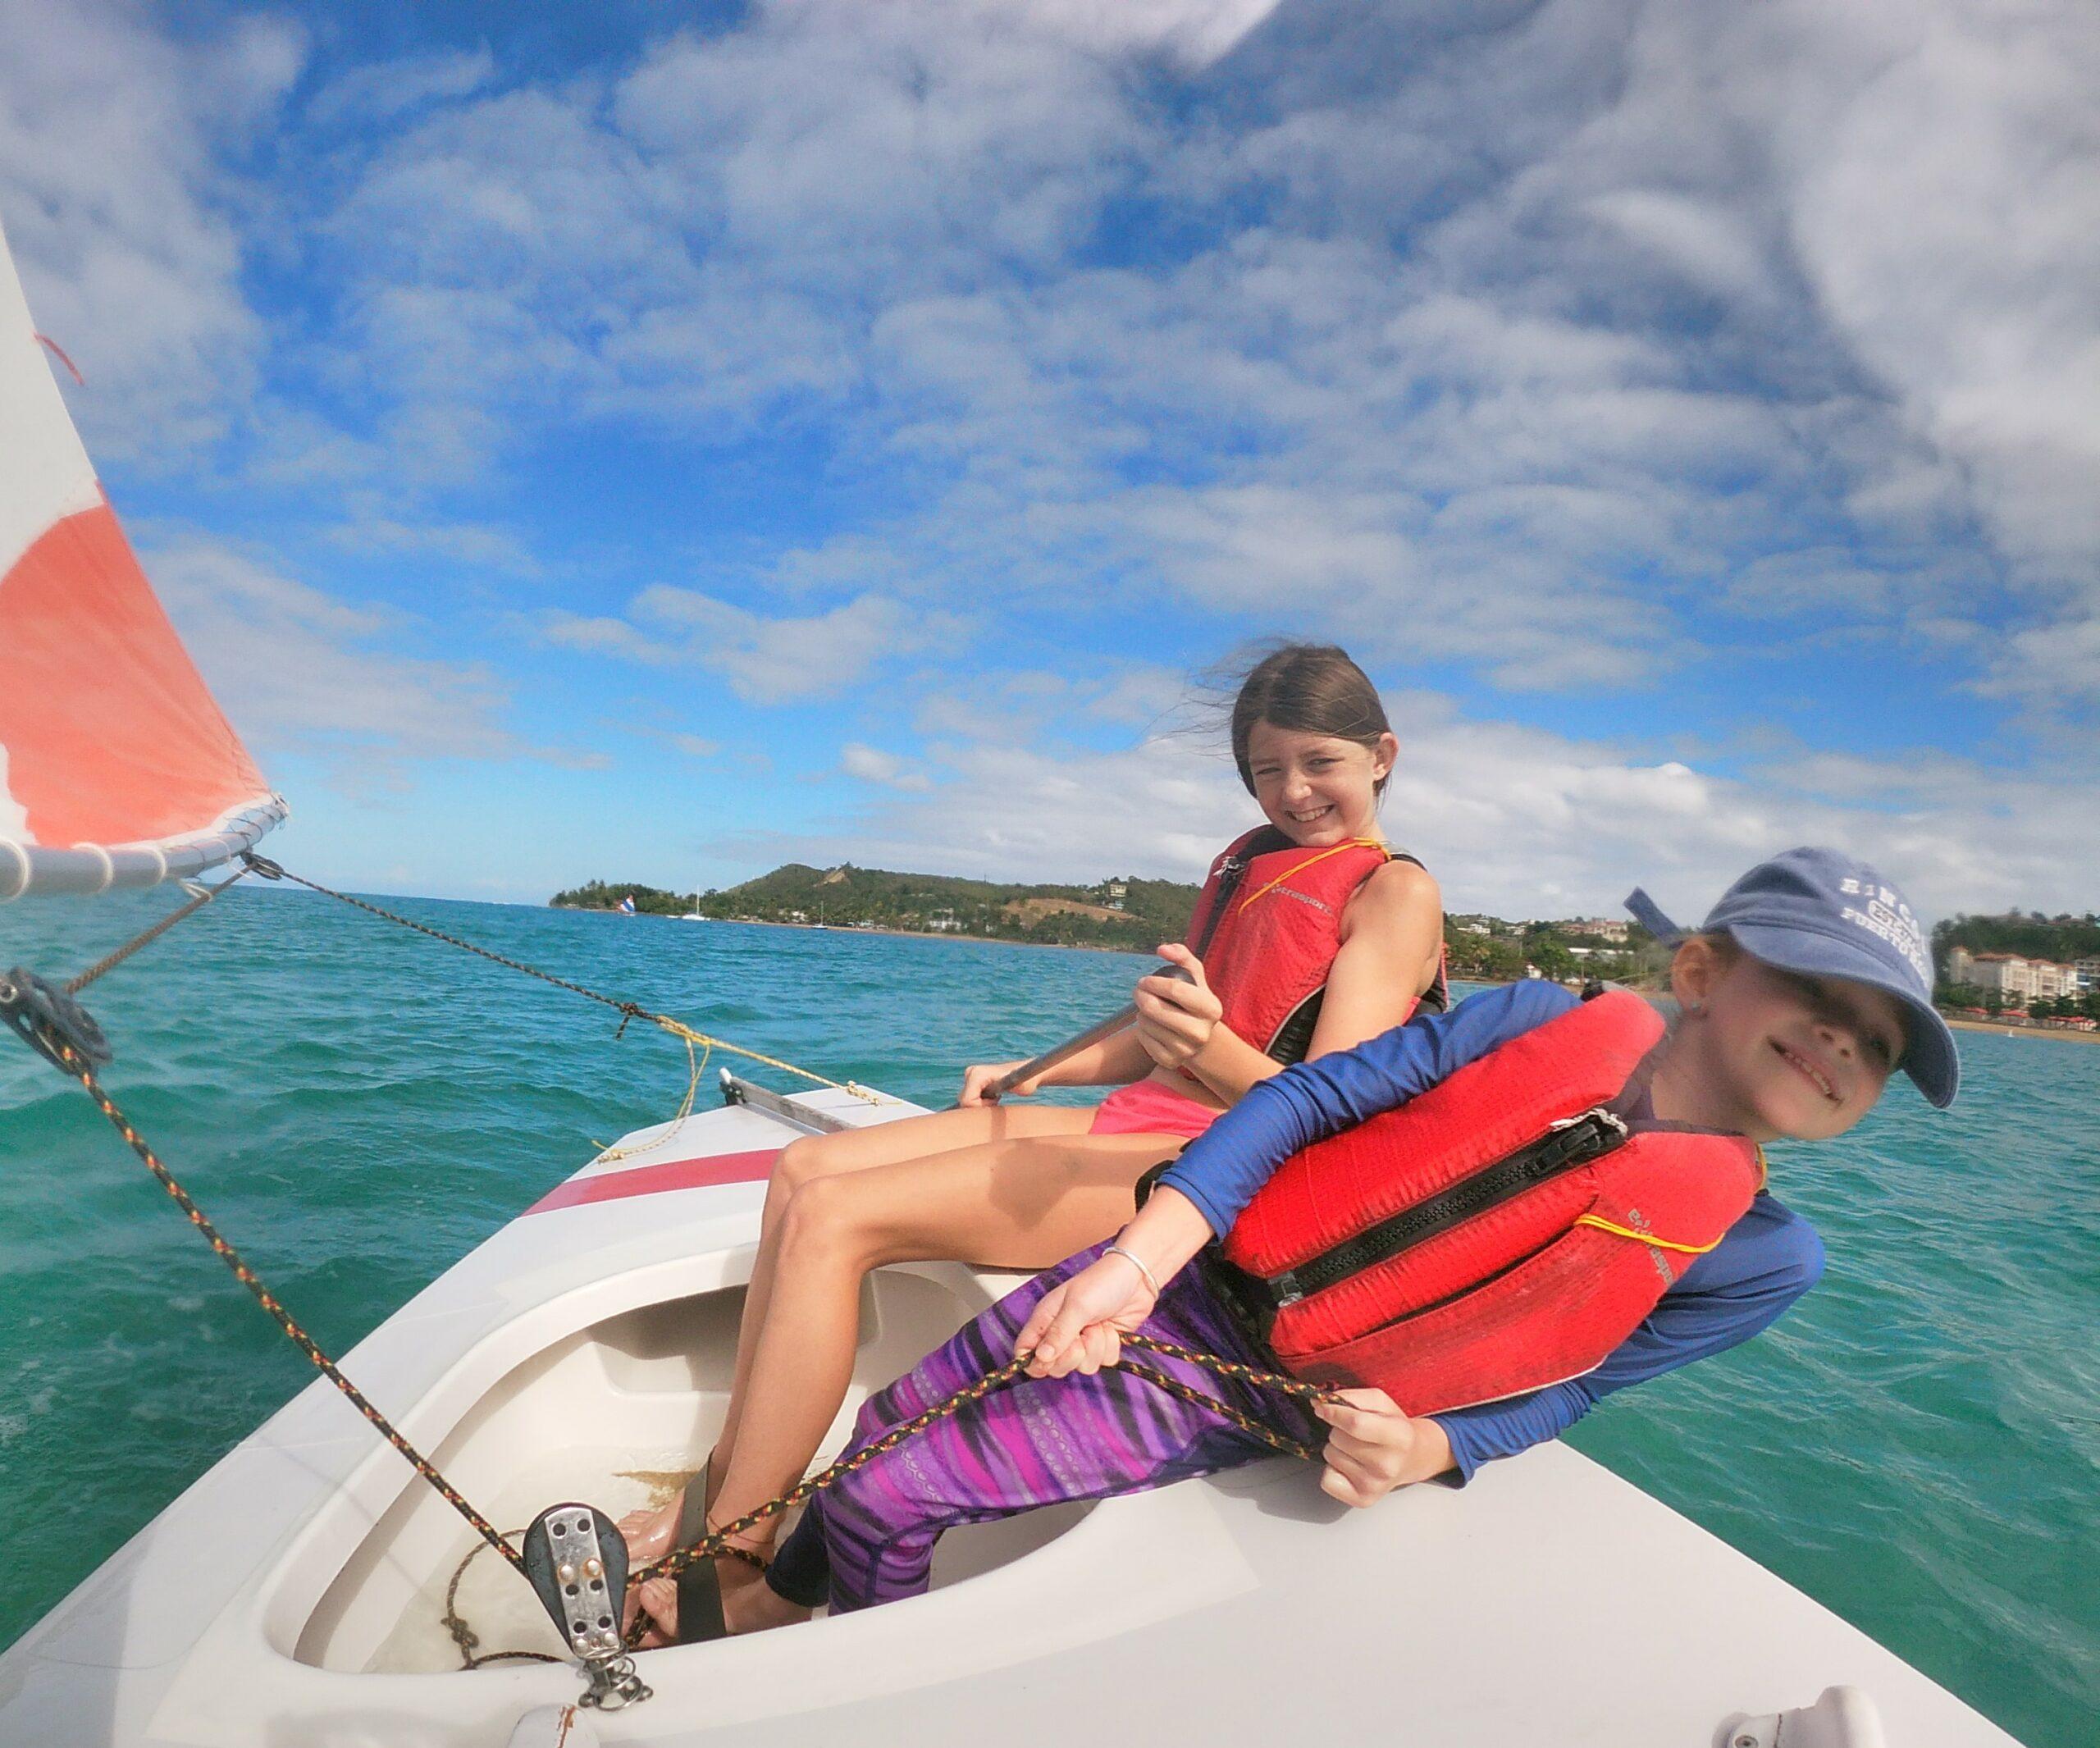 www.rinconsailing.com youth sailing camp